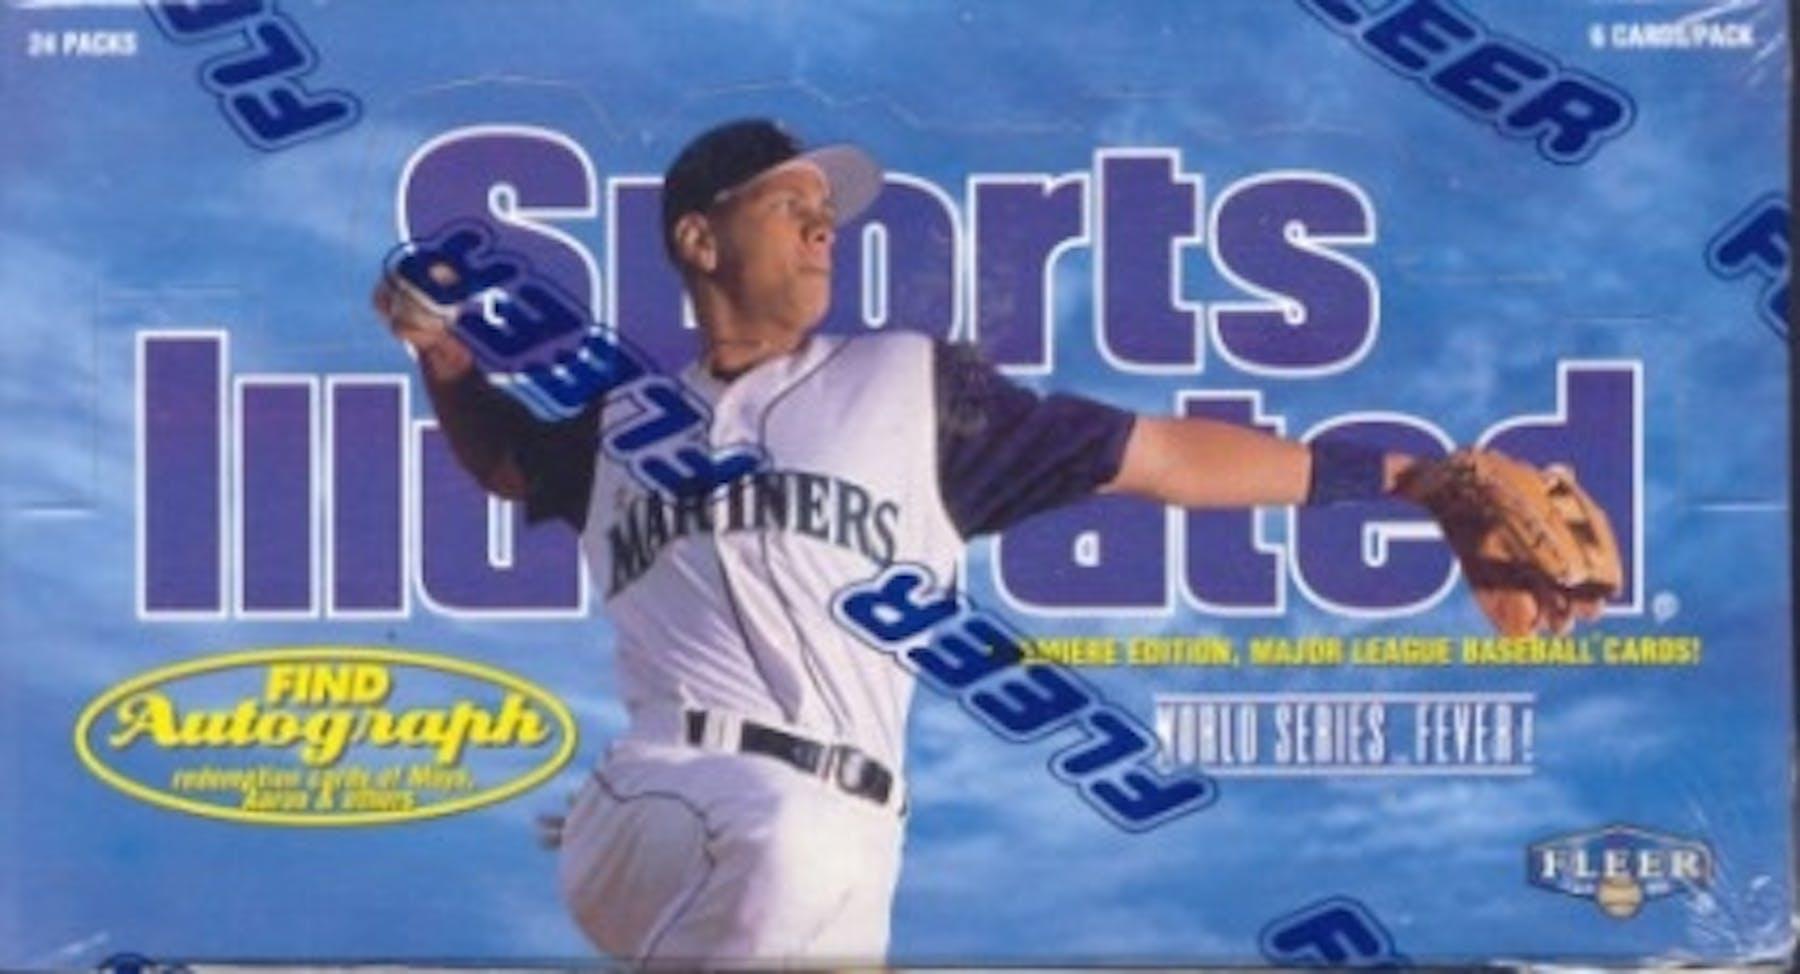 1997 Fleer Sports Illustrated Baseball Hobby Box Da Card World